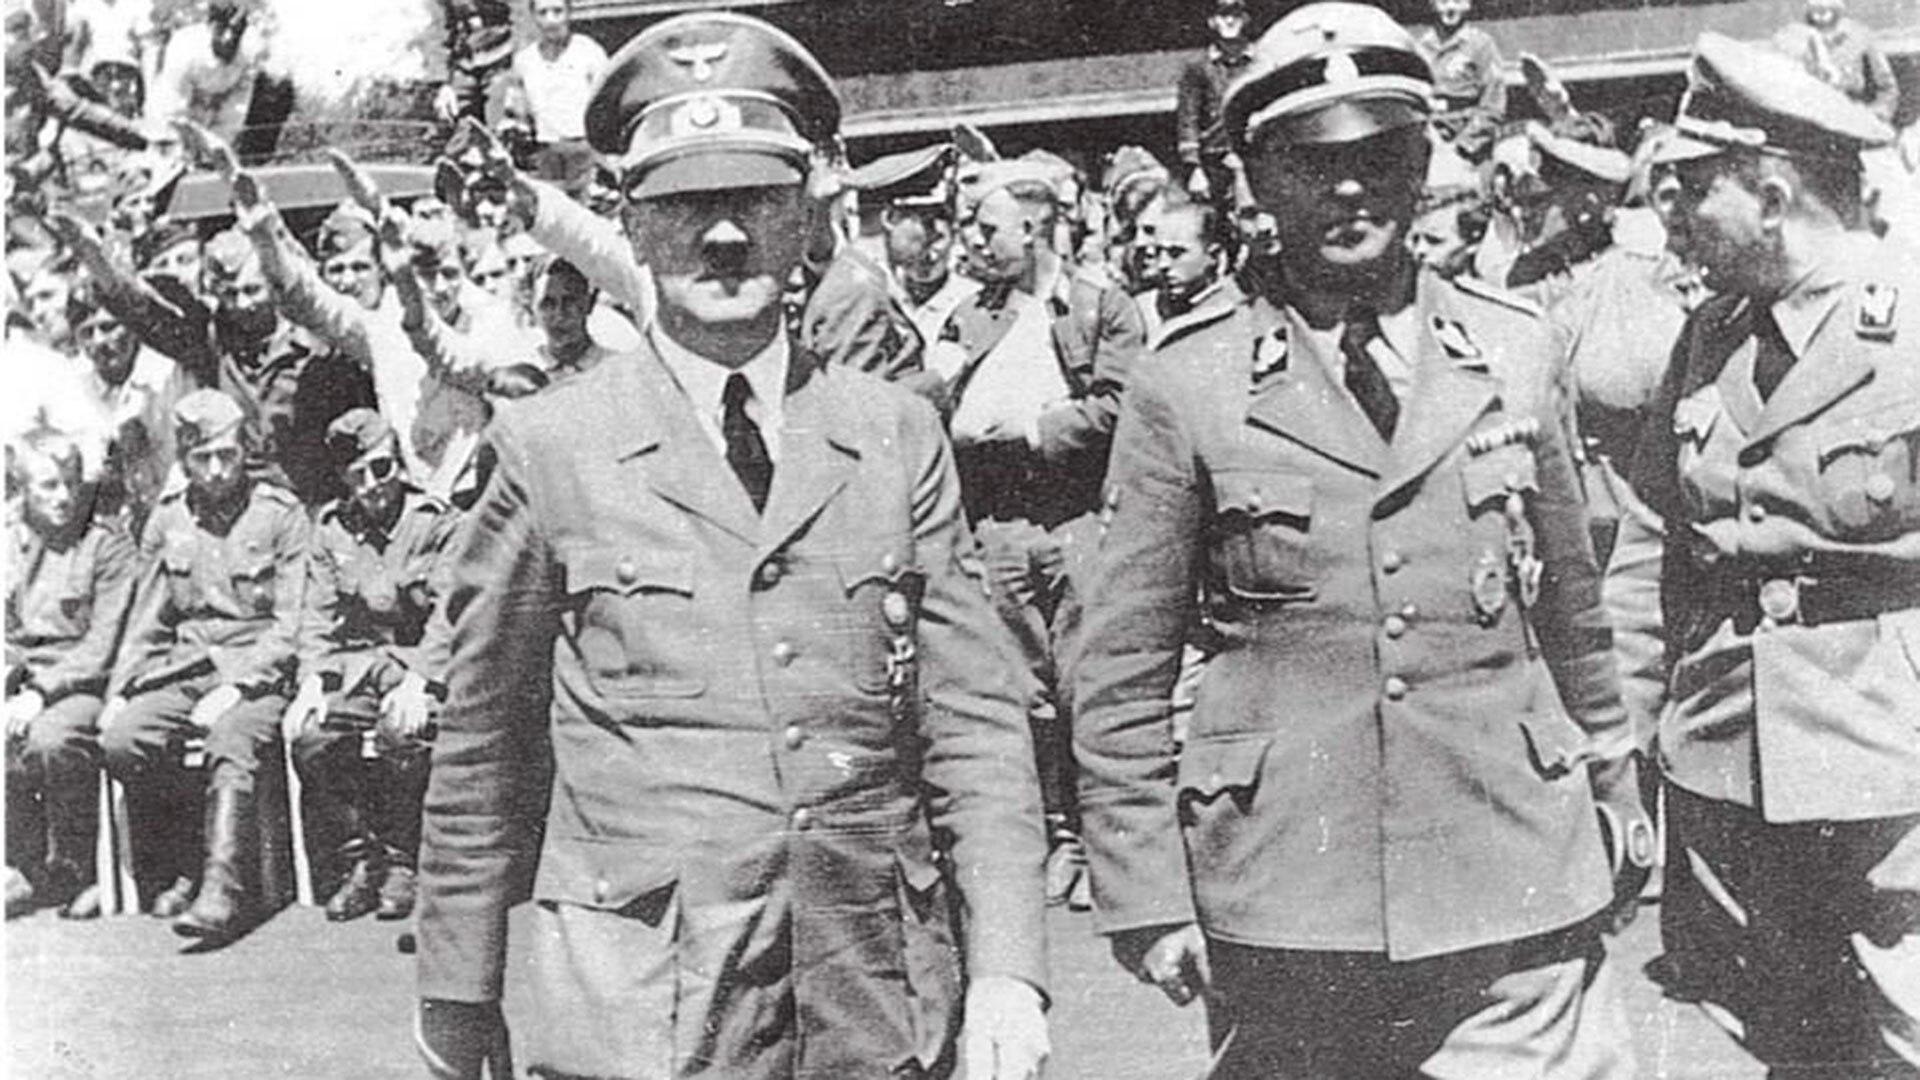 Peliculas Porno De Nazis documentos desclasificados revelaron nueva información sobre